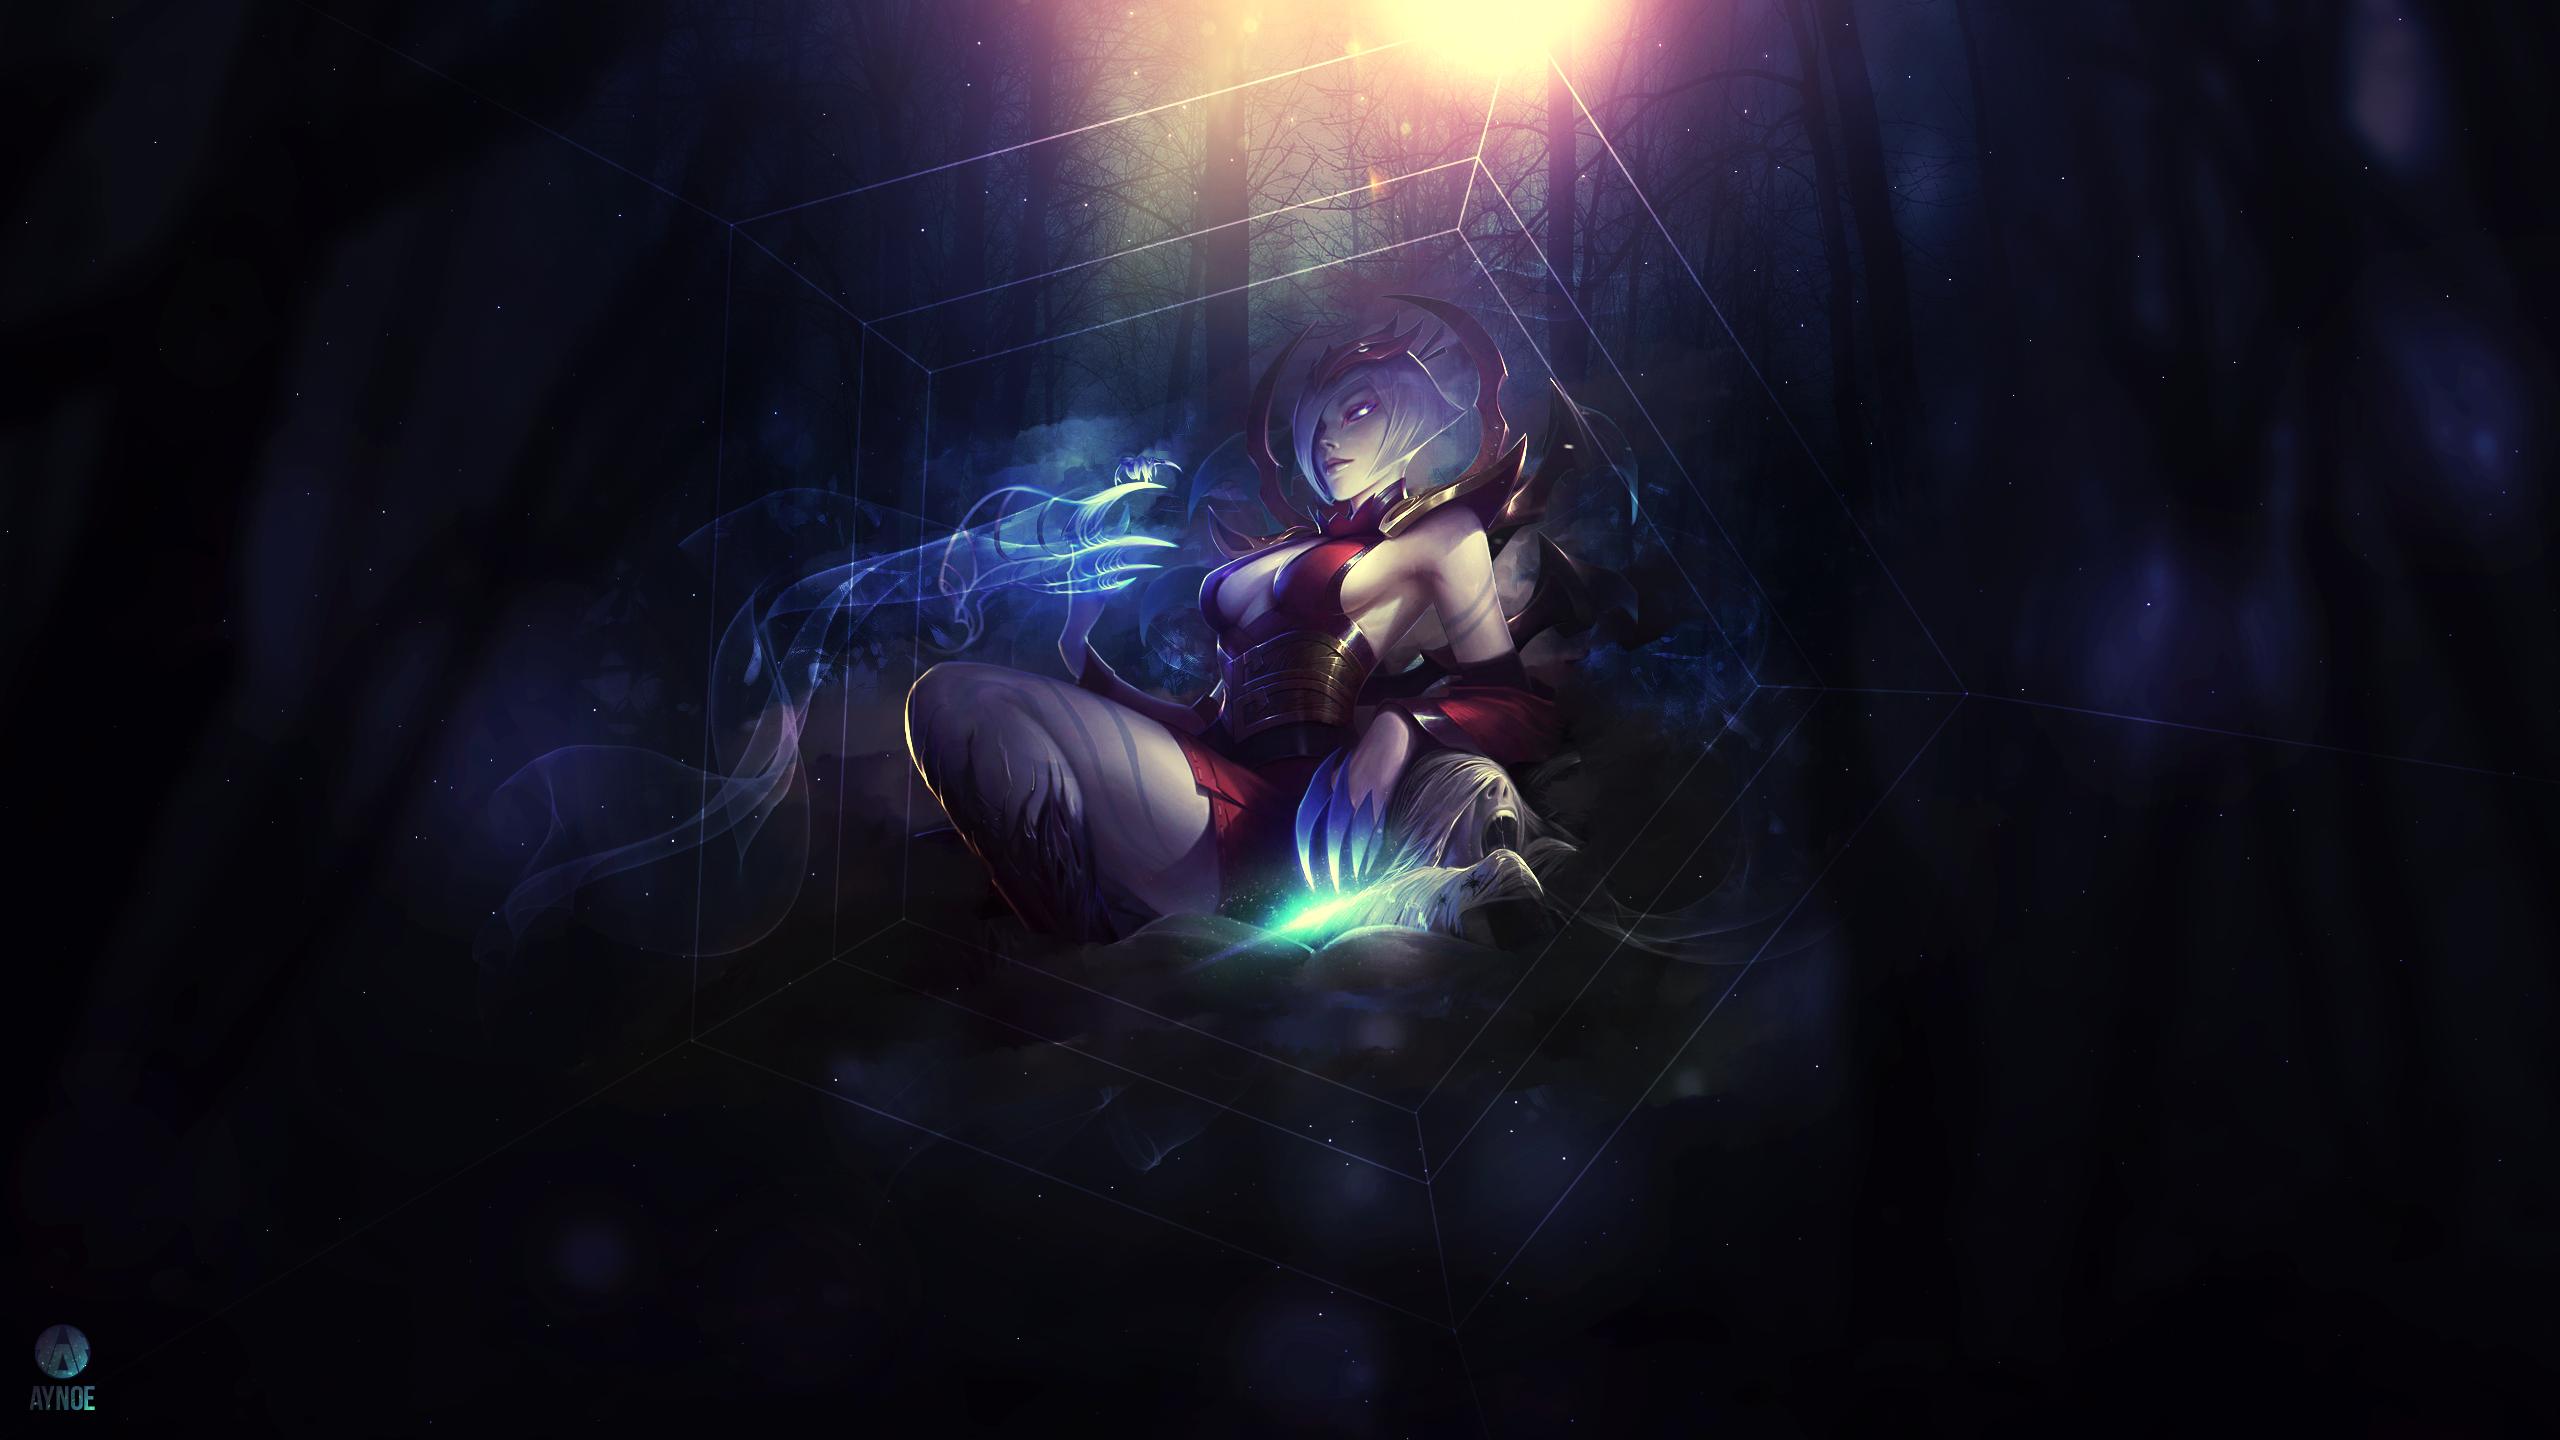 General 2560x1440 League of Legends PC gaming fantasy girl dark video games